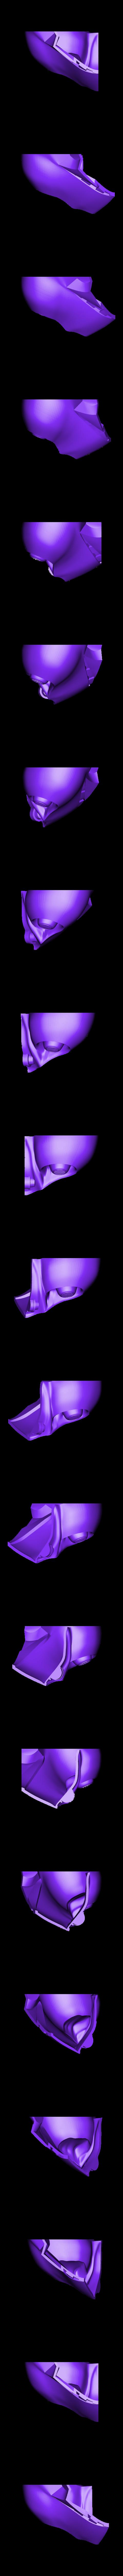 Part 9 v3.stl Download free STL file Clone Trooper Helmet Phase 2 Star Wars • 3D printable template, VillainousPropShop